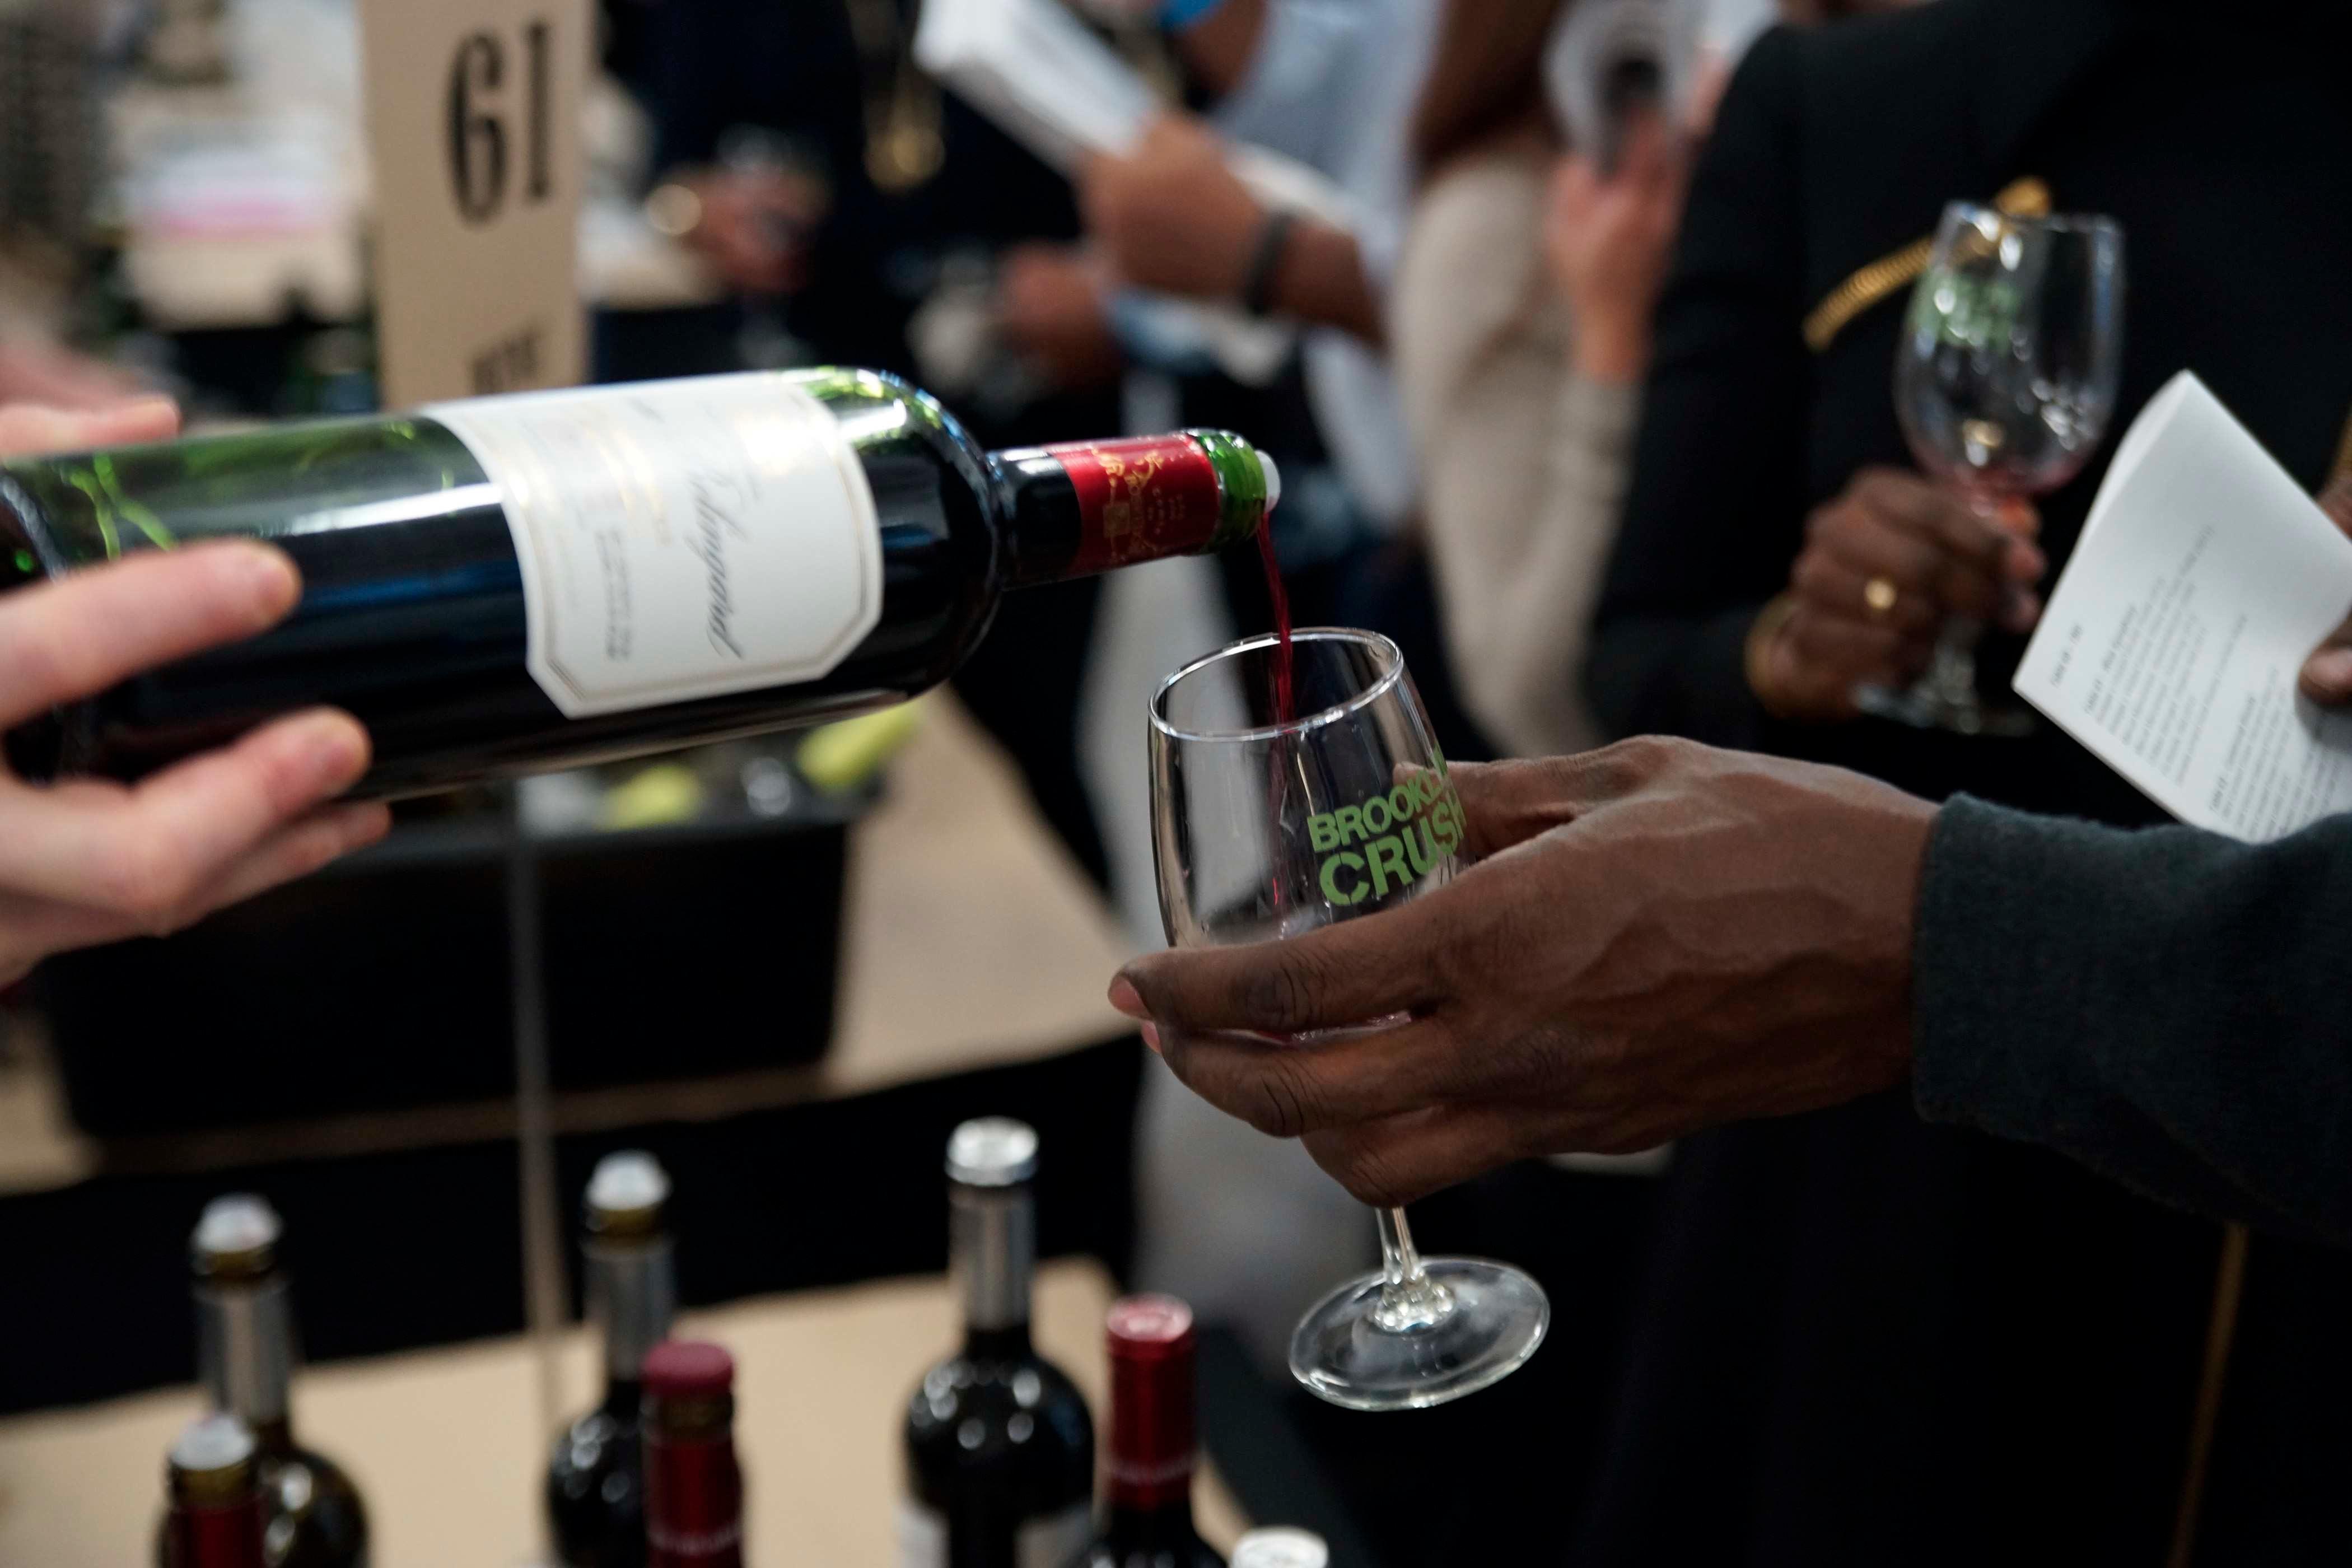 Brooklyn Crush Wine Artisanal Food Festival